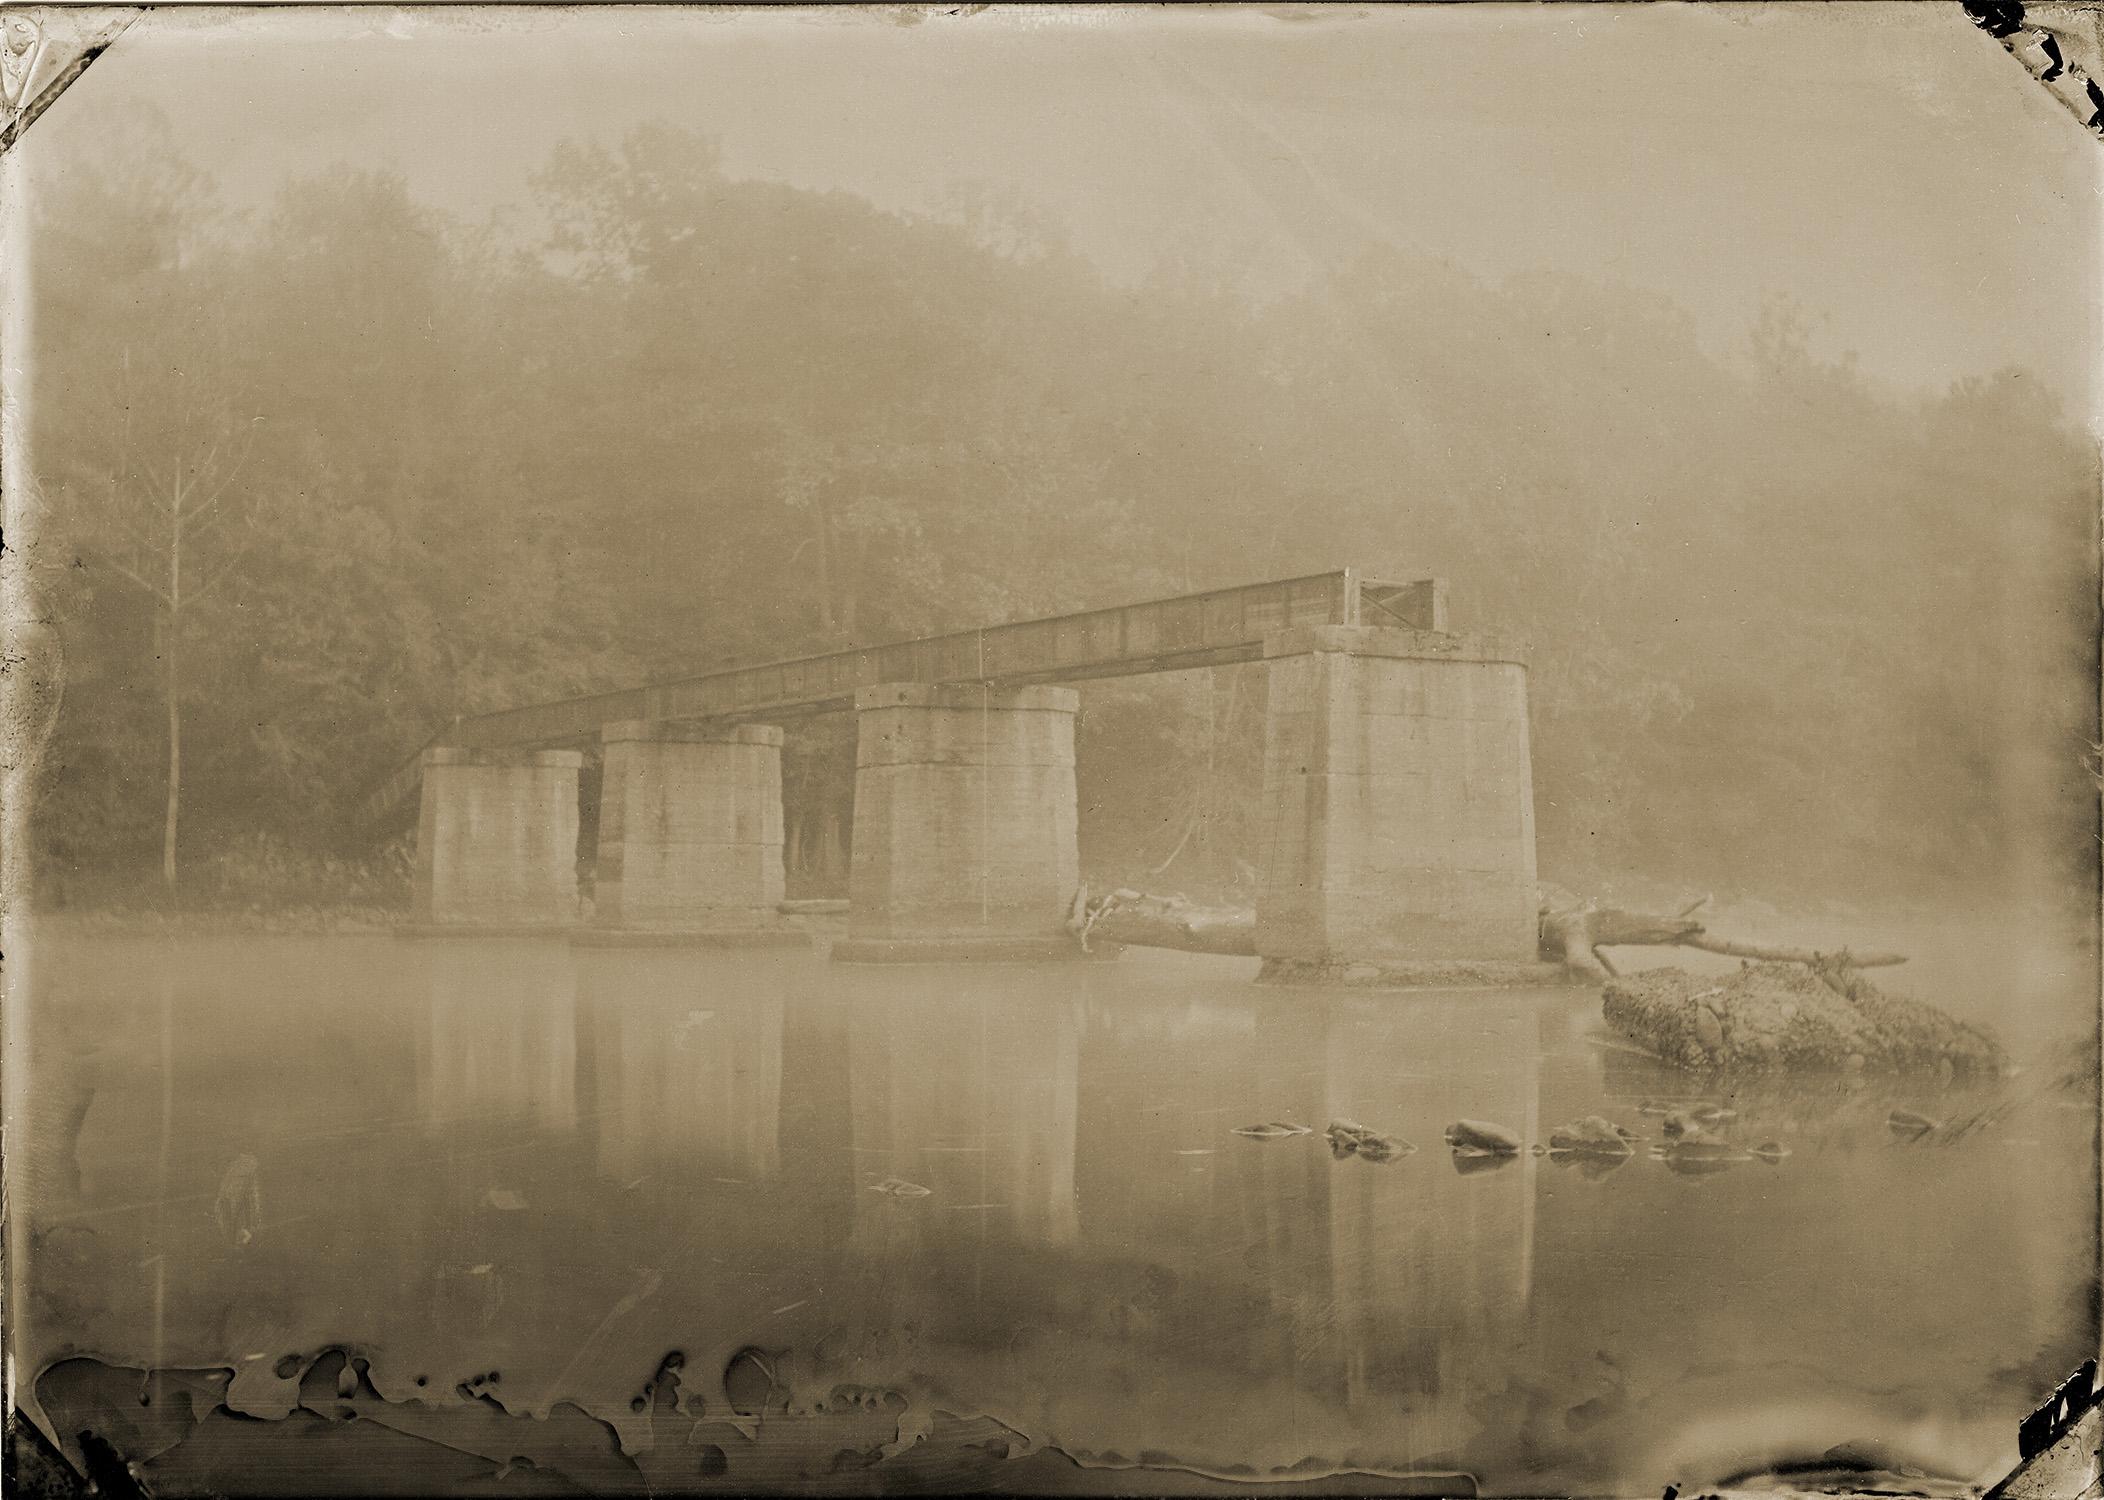 """Bridge in Fog (Albright, WV)"" by David R. Cerbone"